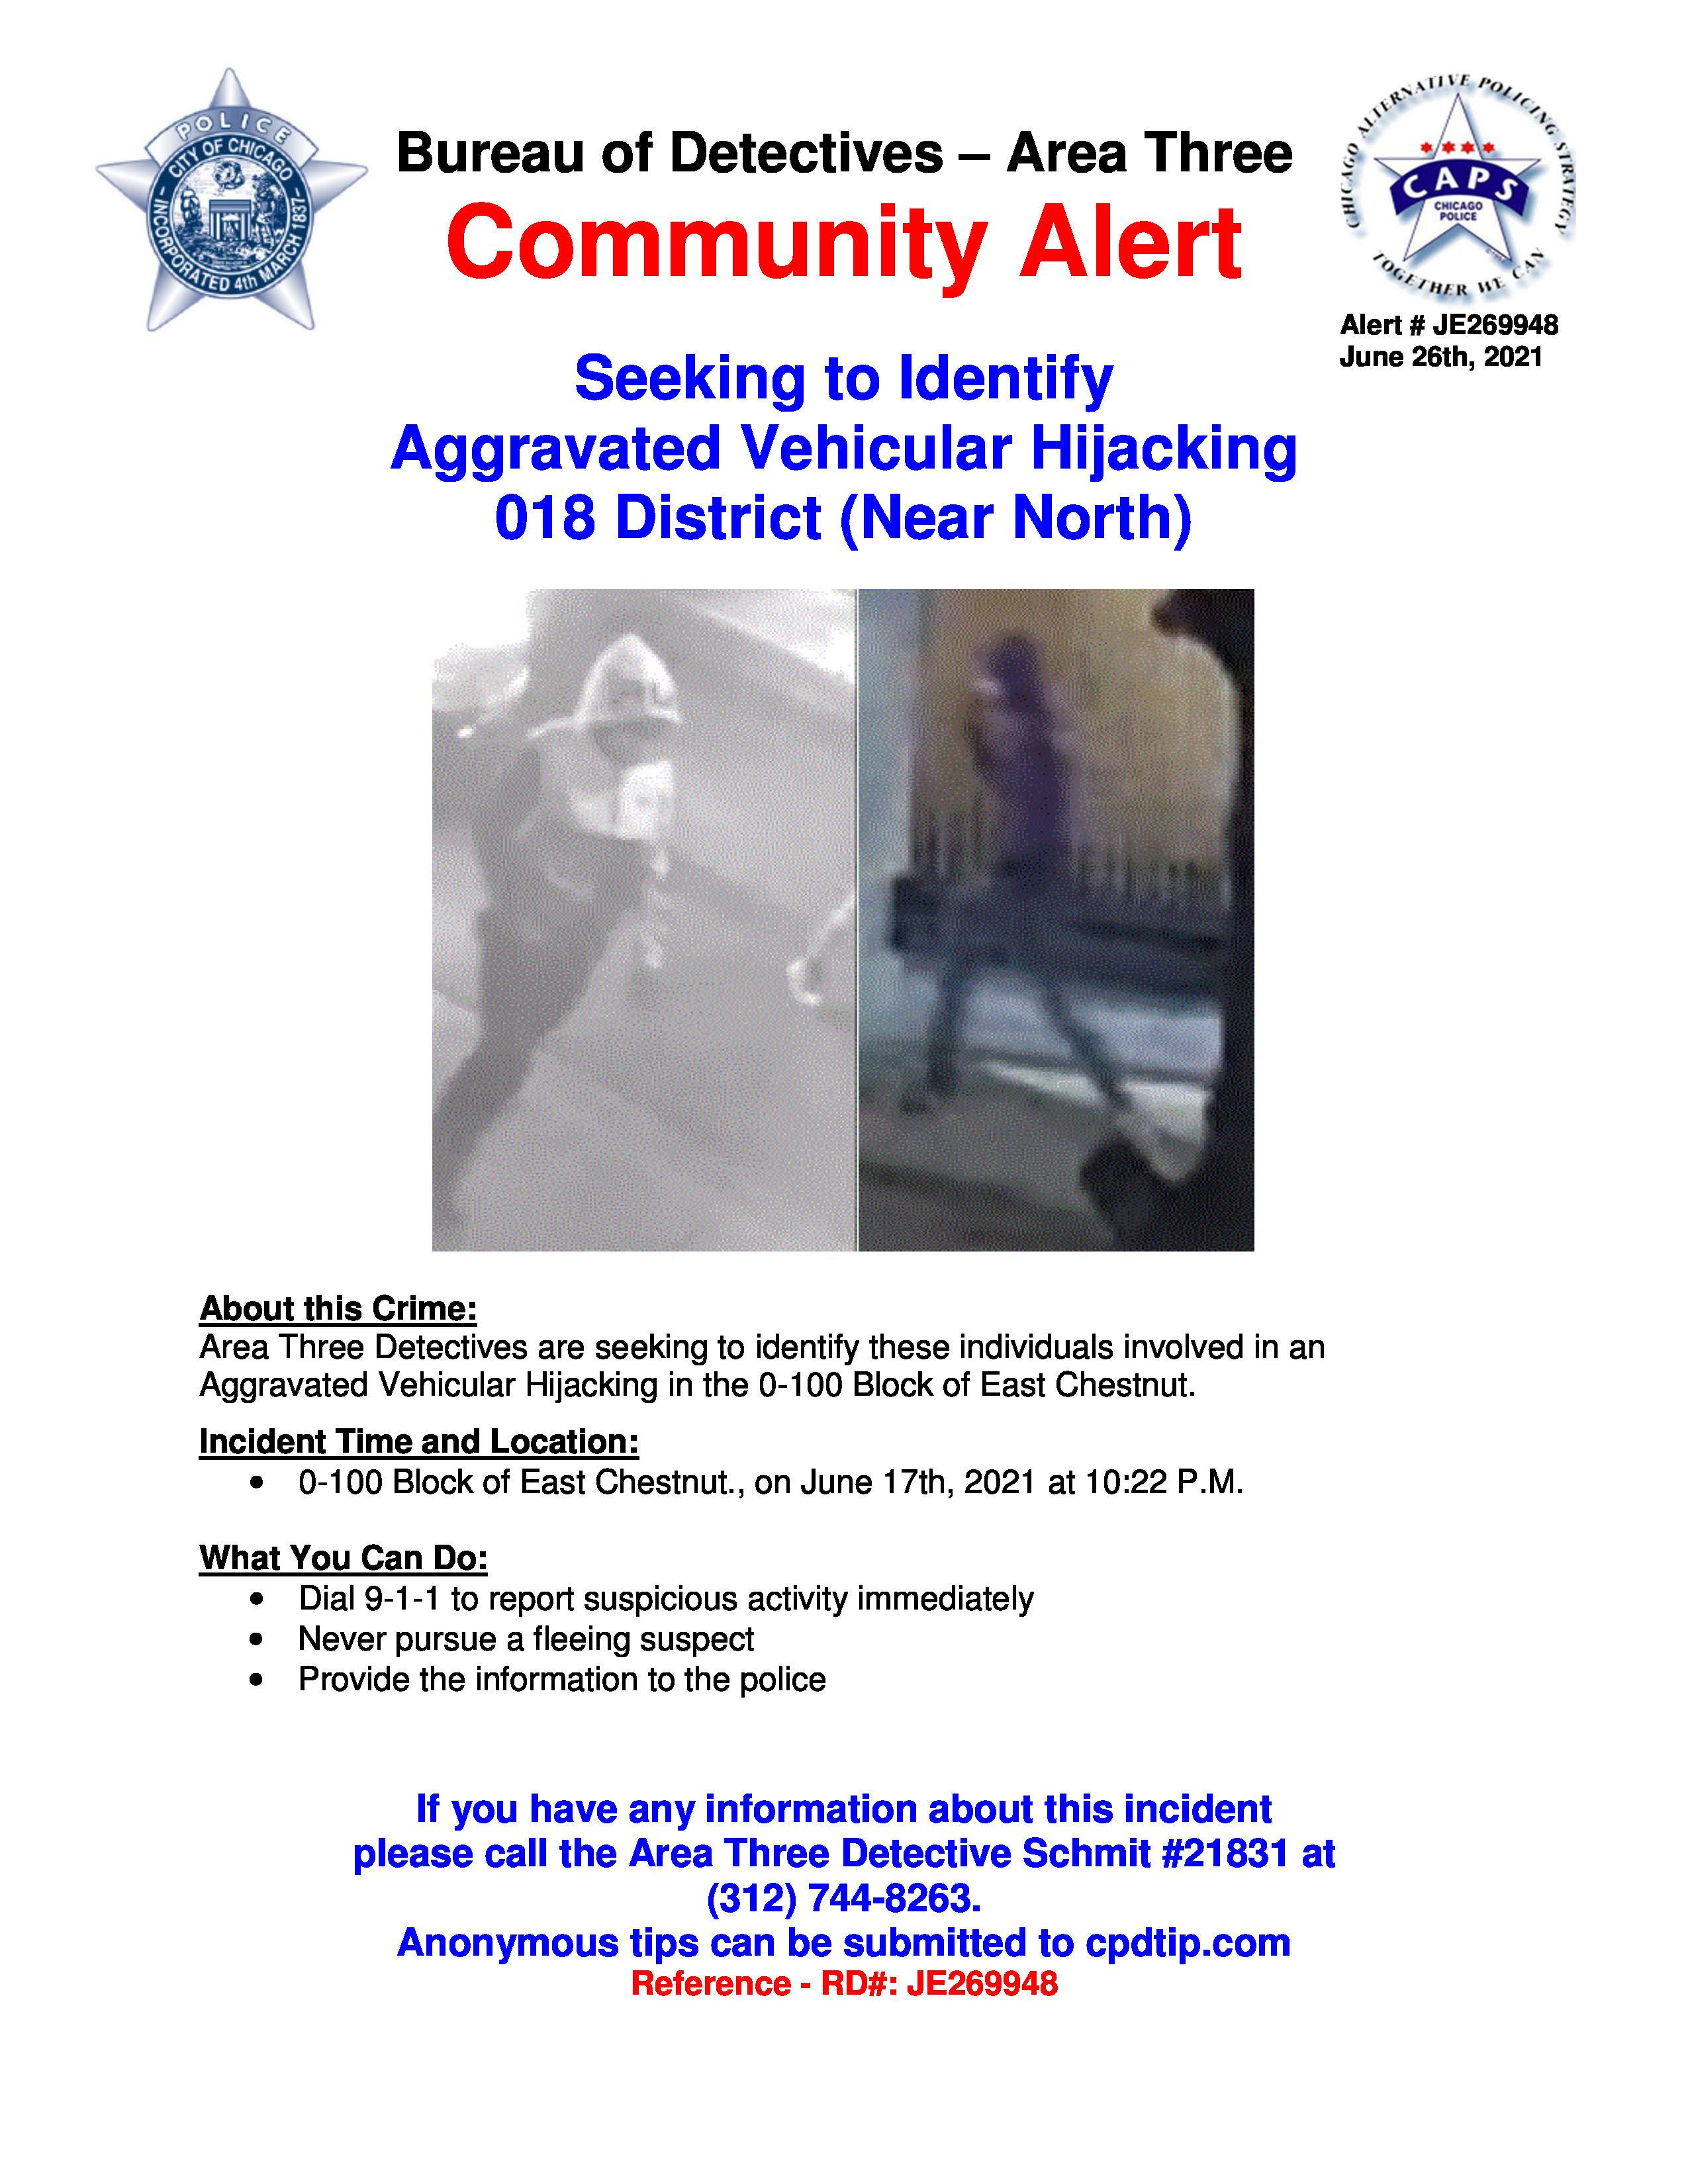 27 Jun 21 - Community Alert Seeking to Identify_Page_1